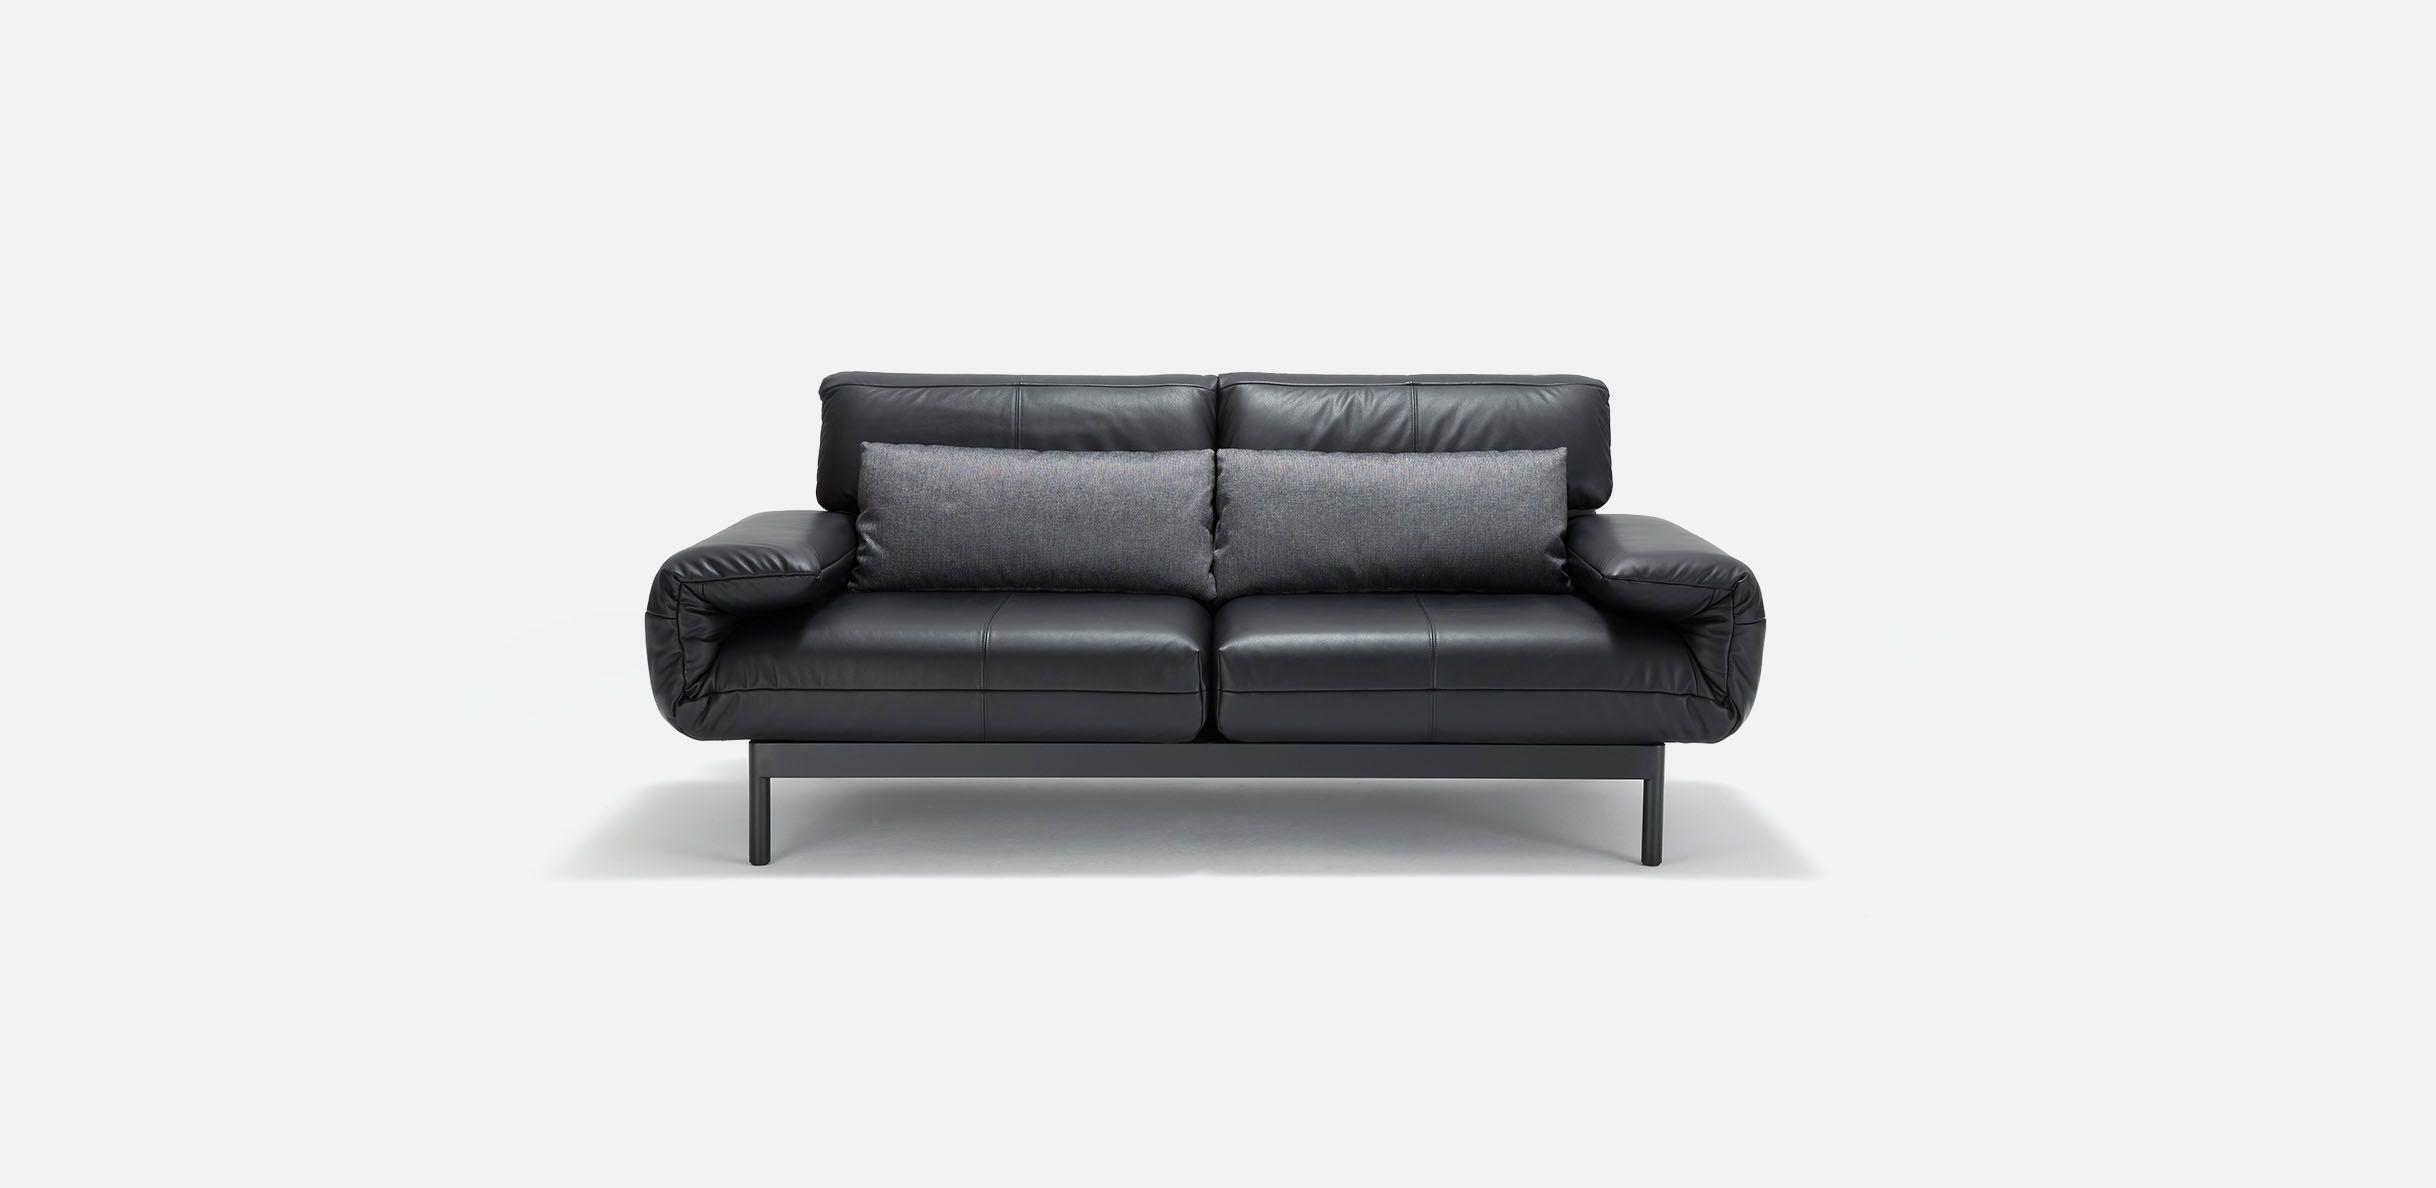 Rolf Benz Plura One Sofa With Many Faces Livingroom